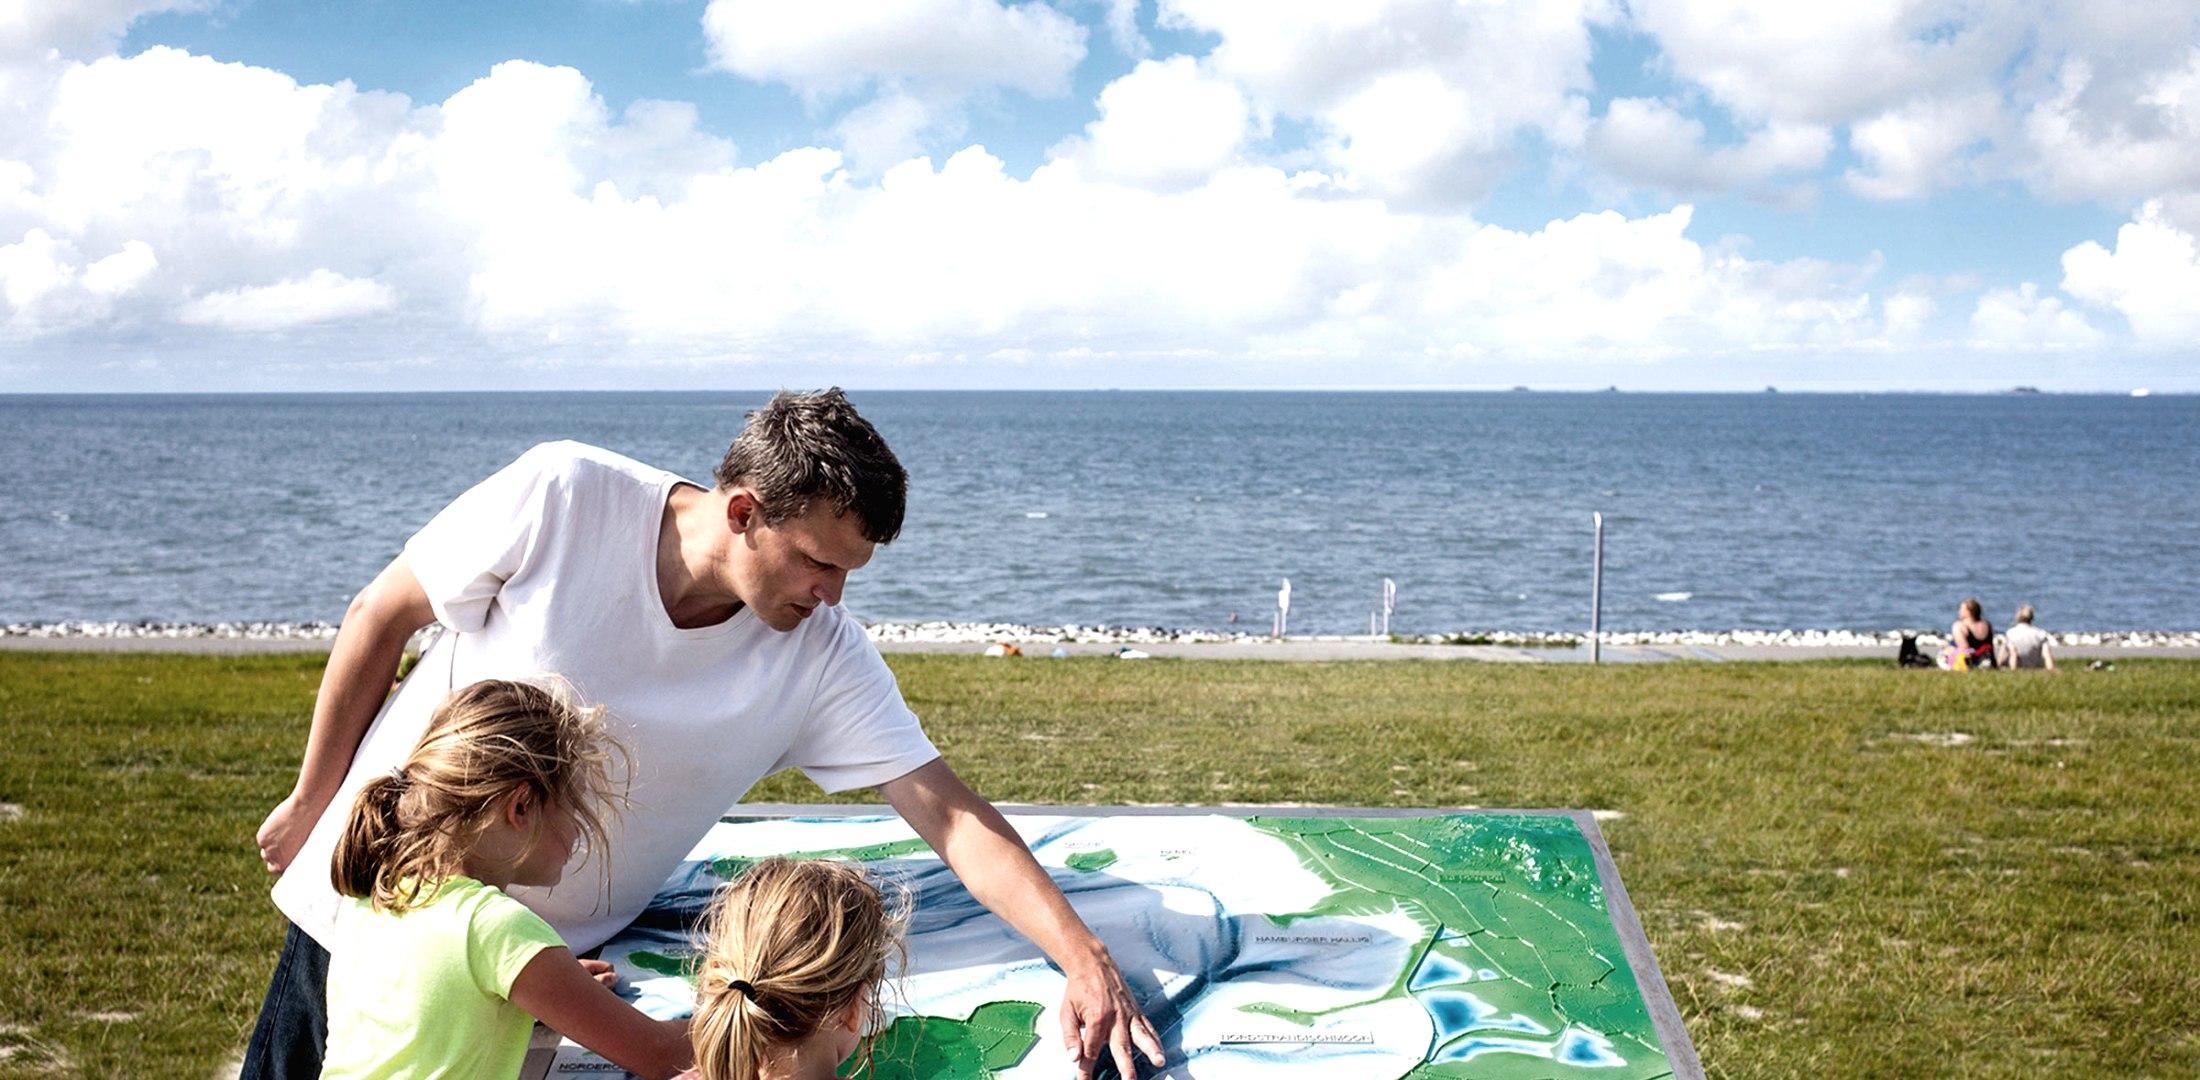 Thementafel gibt Auskunft, © Nordstrand Tourismus